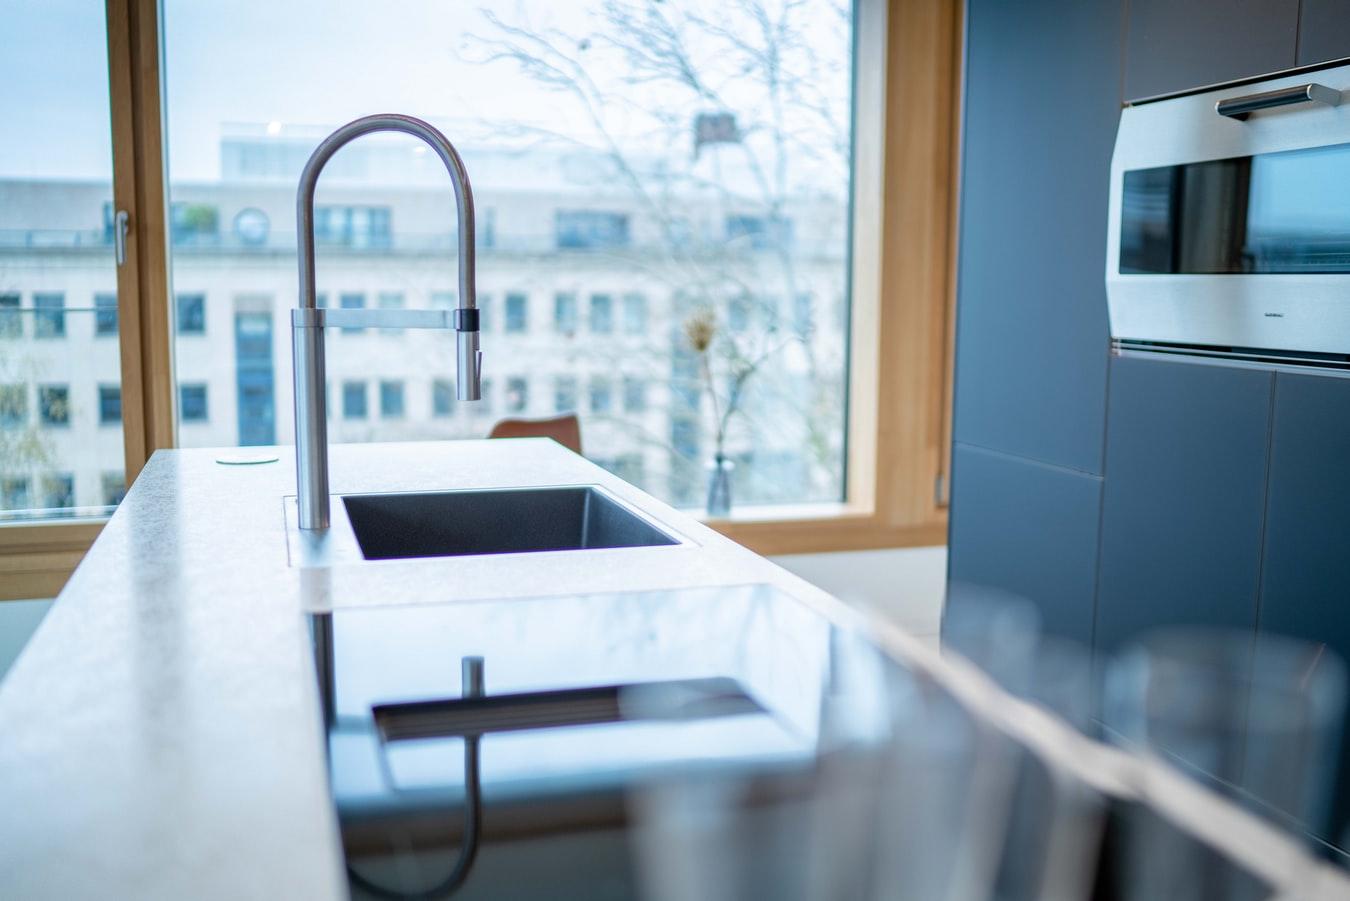 loose sink faucet